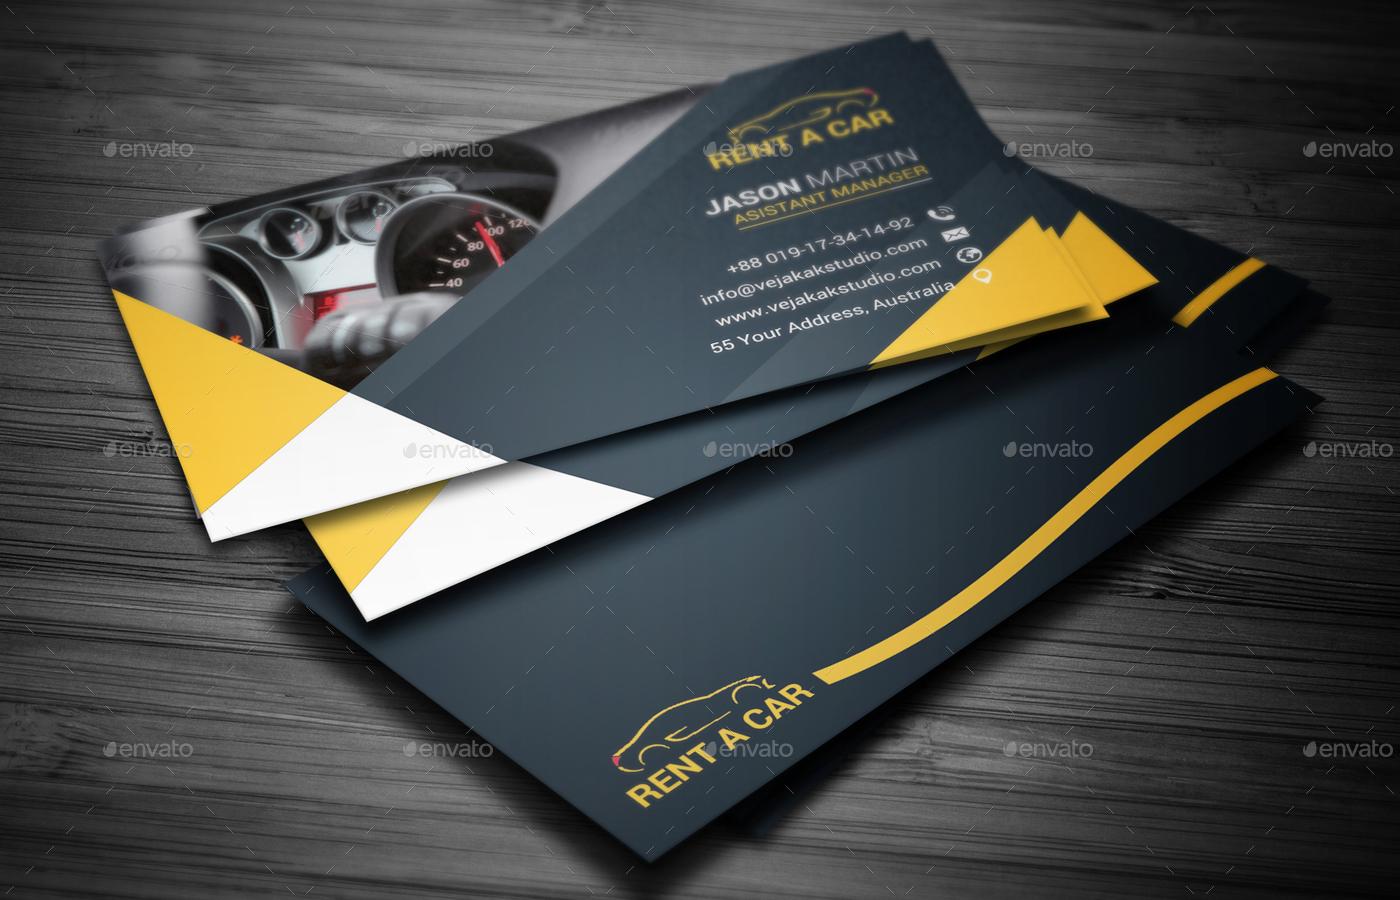 Rent A Car Business Card by vejakakstudio   GraphicRiver